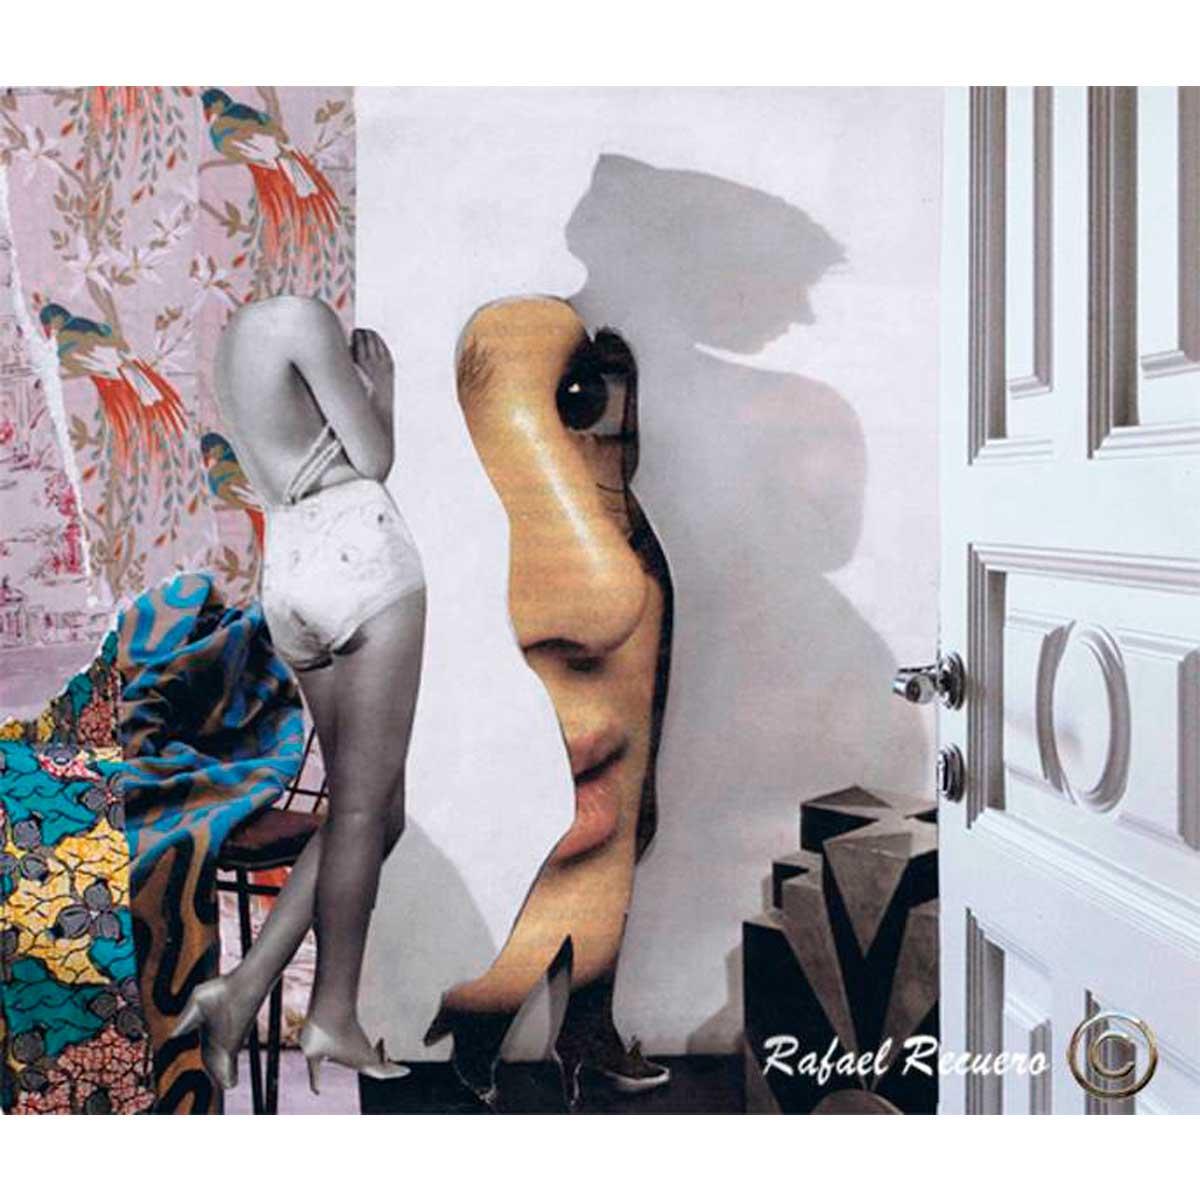 RAFAEL RECUERO - Cita con Venus (collage)